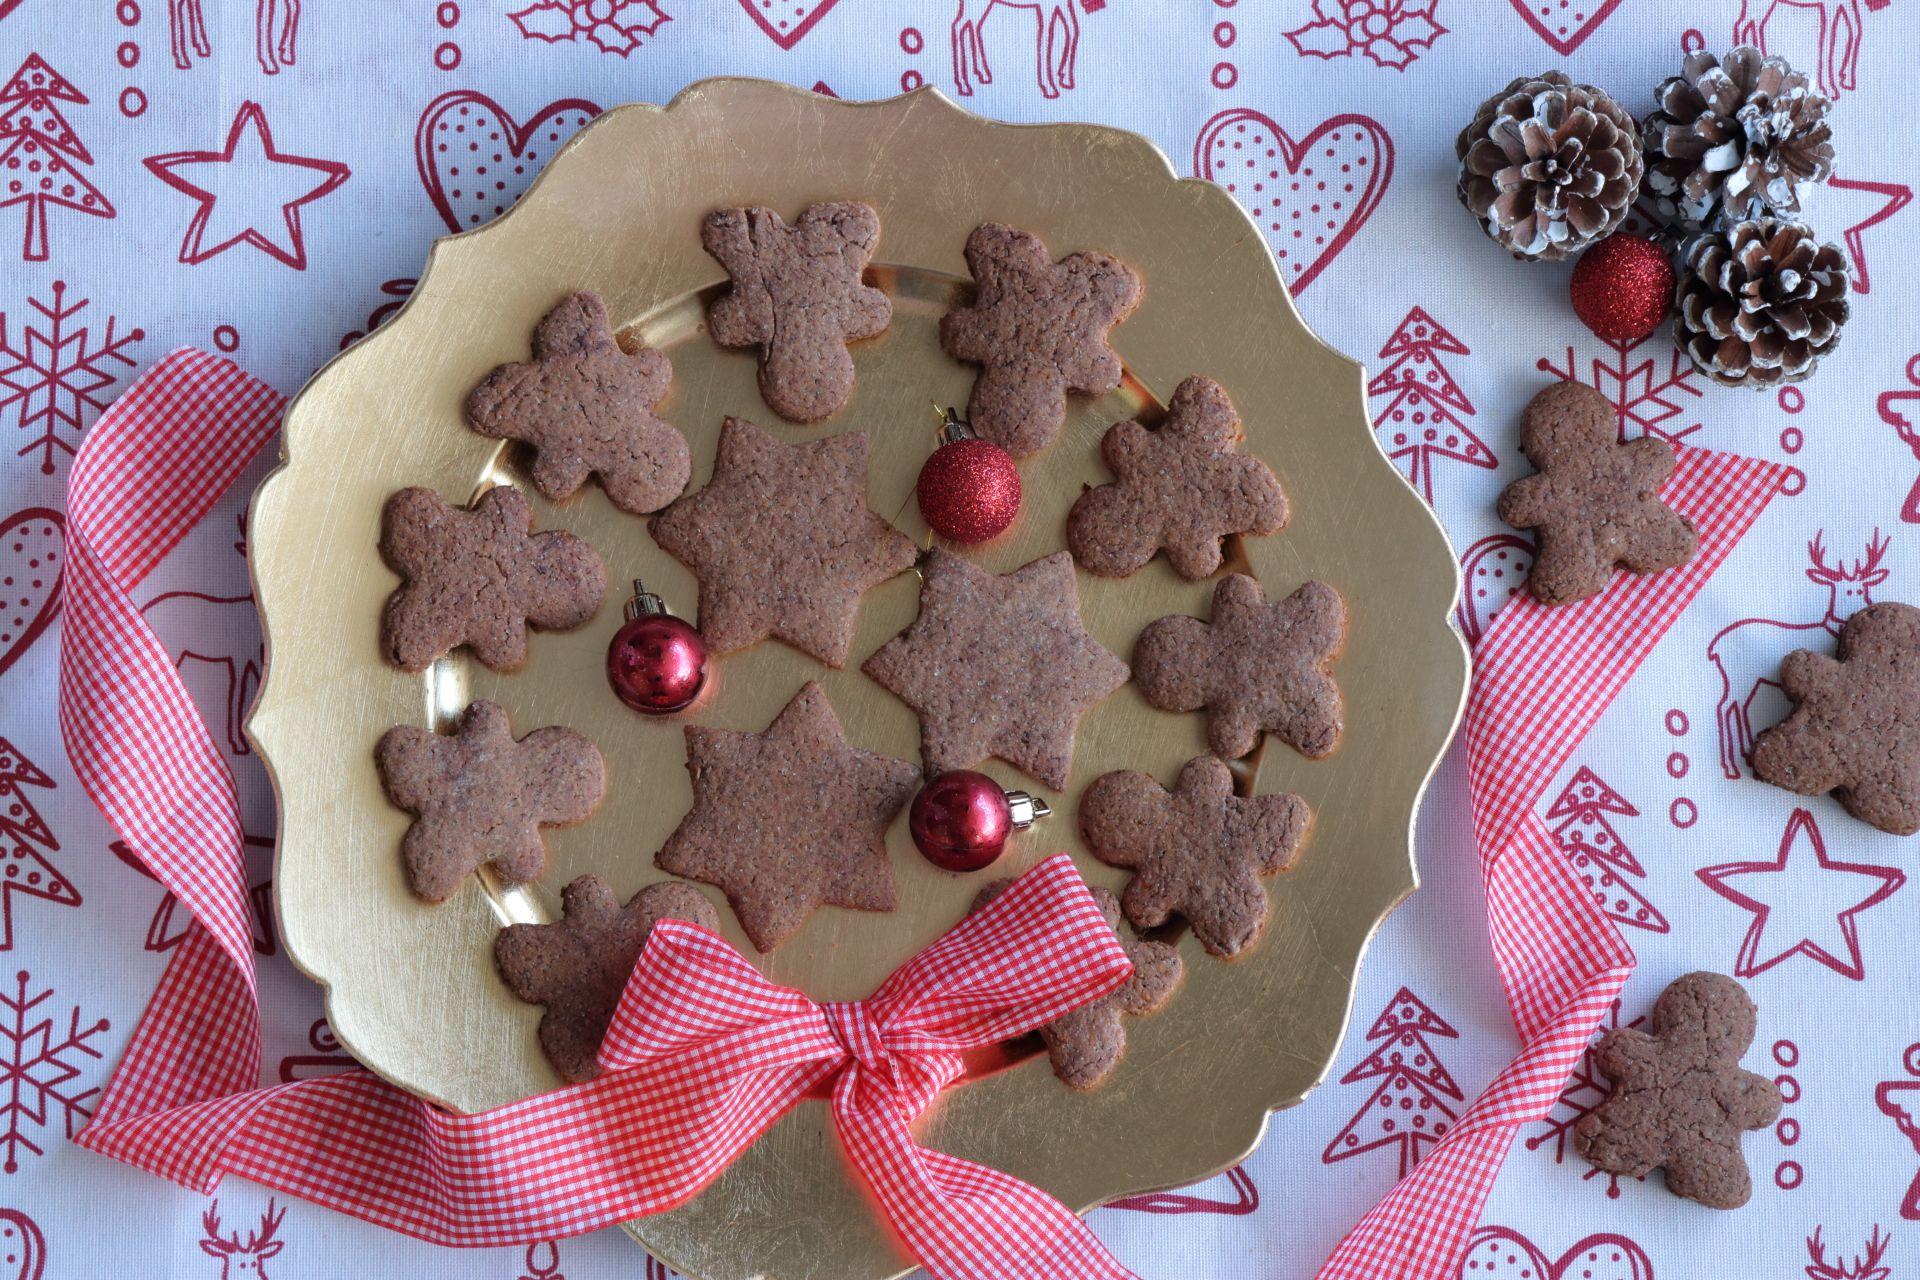 SQSP-C151-Σοκολατένια-μπισκότα-με-τζίντζερ-και-κανέλα-IMG_4012_1.jpg